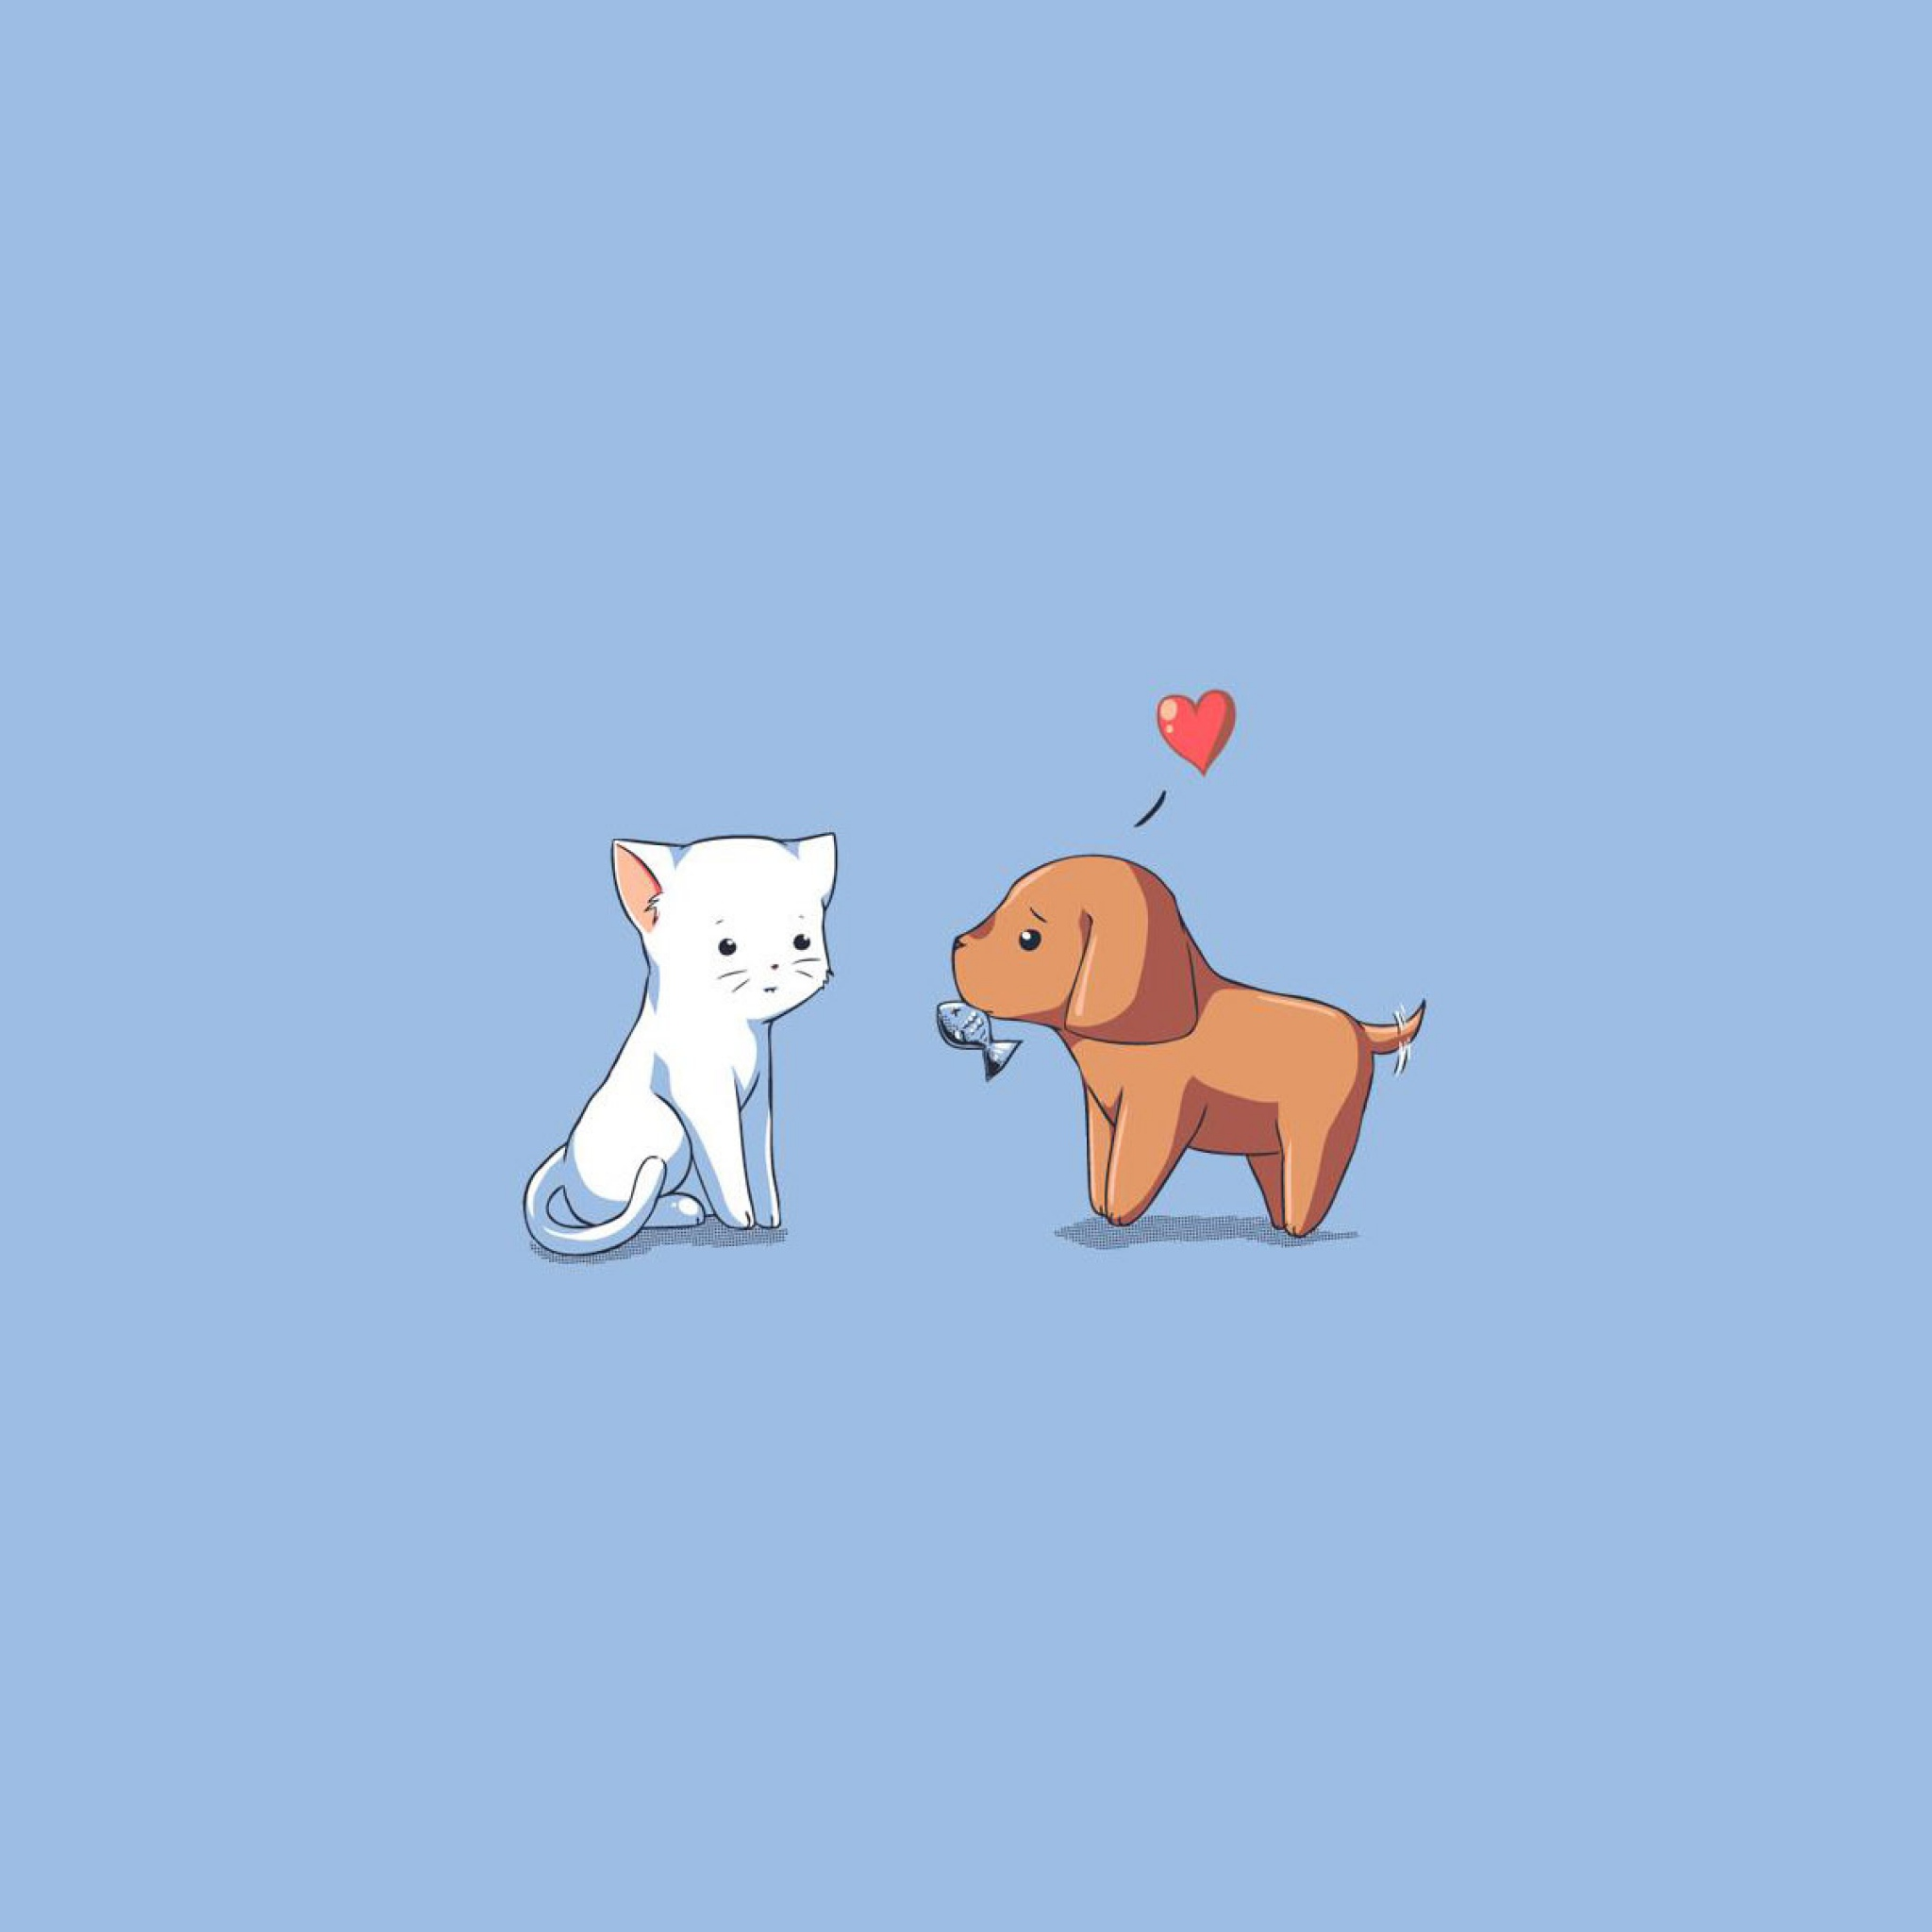 2048x2048 Download Wallpaper 2048x2048 Dog, Cat, Kitten, Puppy, Drawing